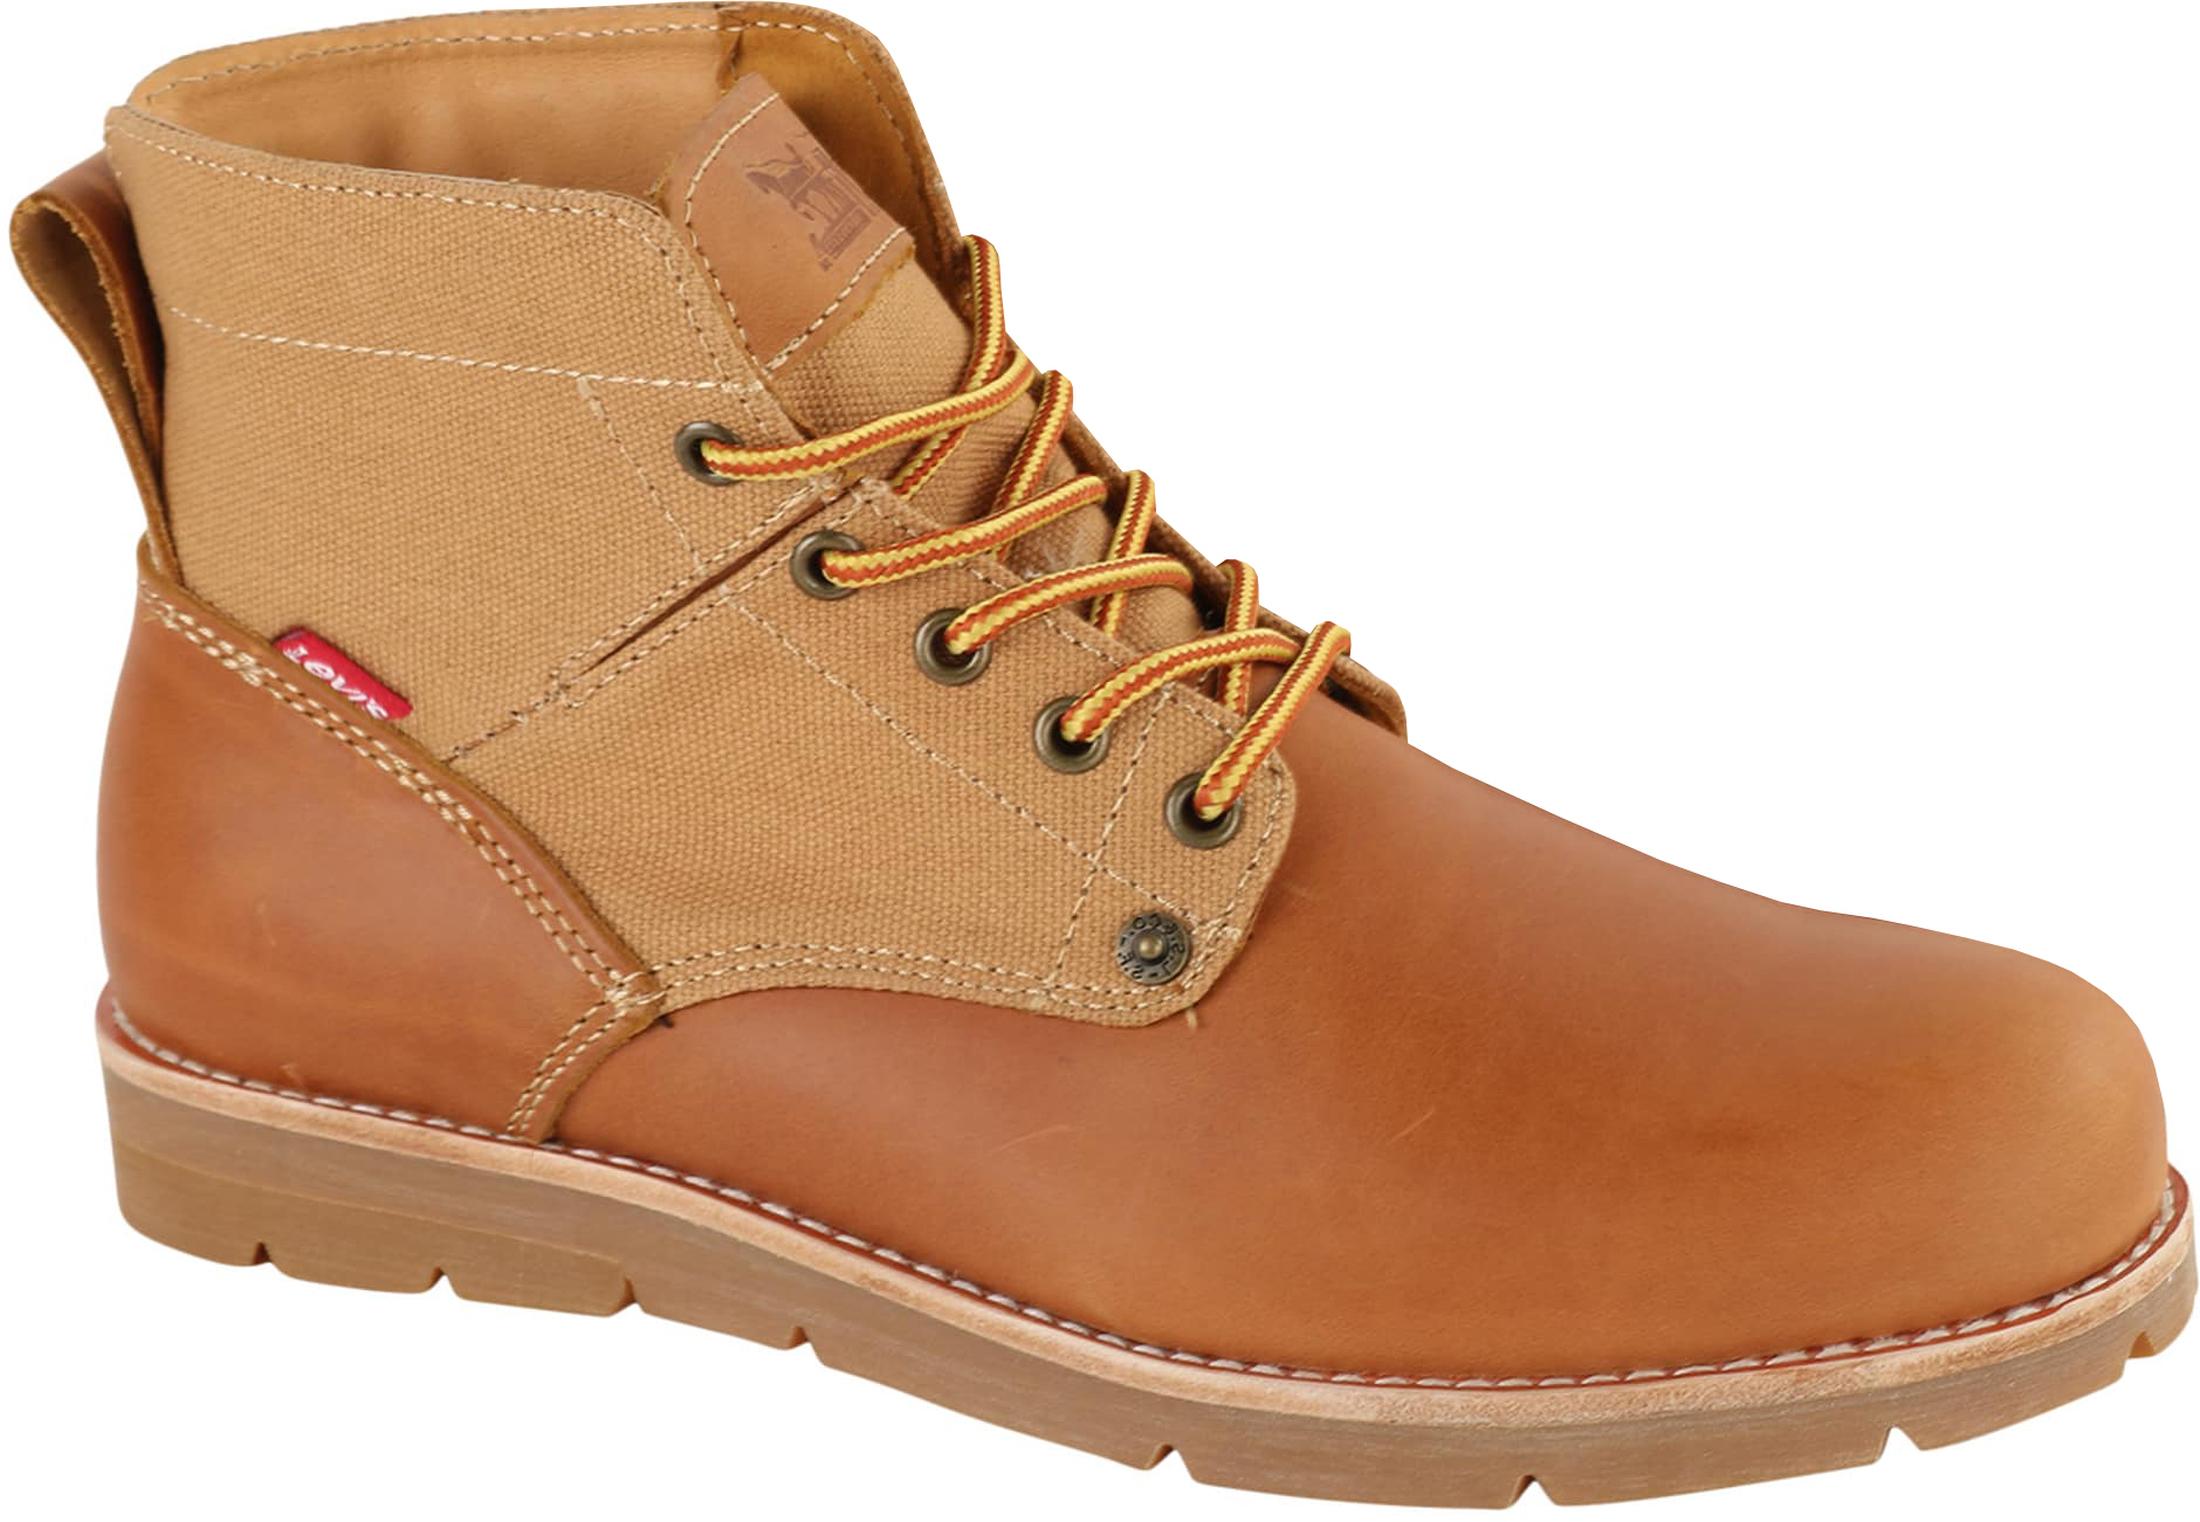 fede8d9af4501 Levi s Jax Boots Cognac 225129 EU 884-74 online kaufen